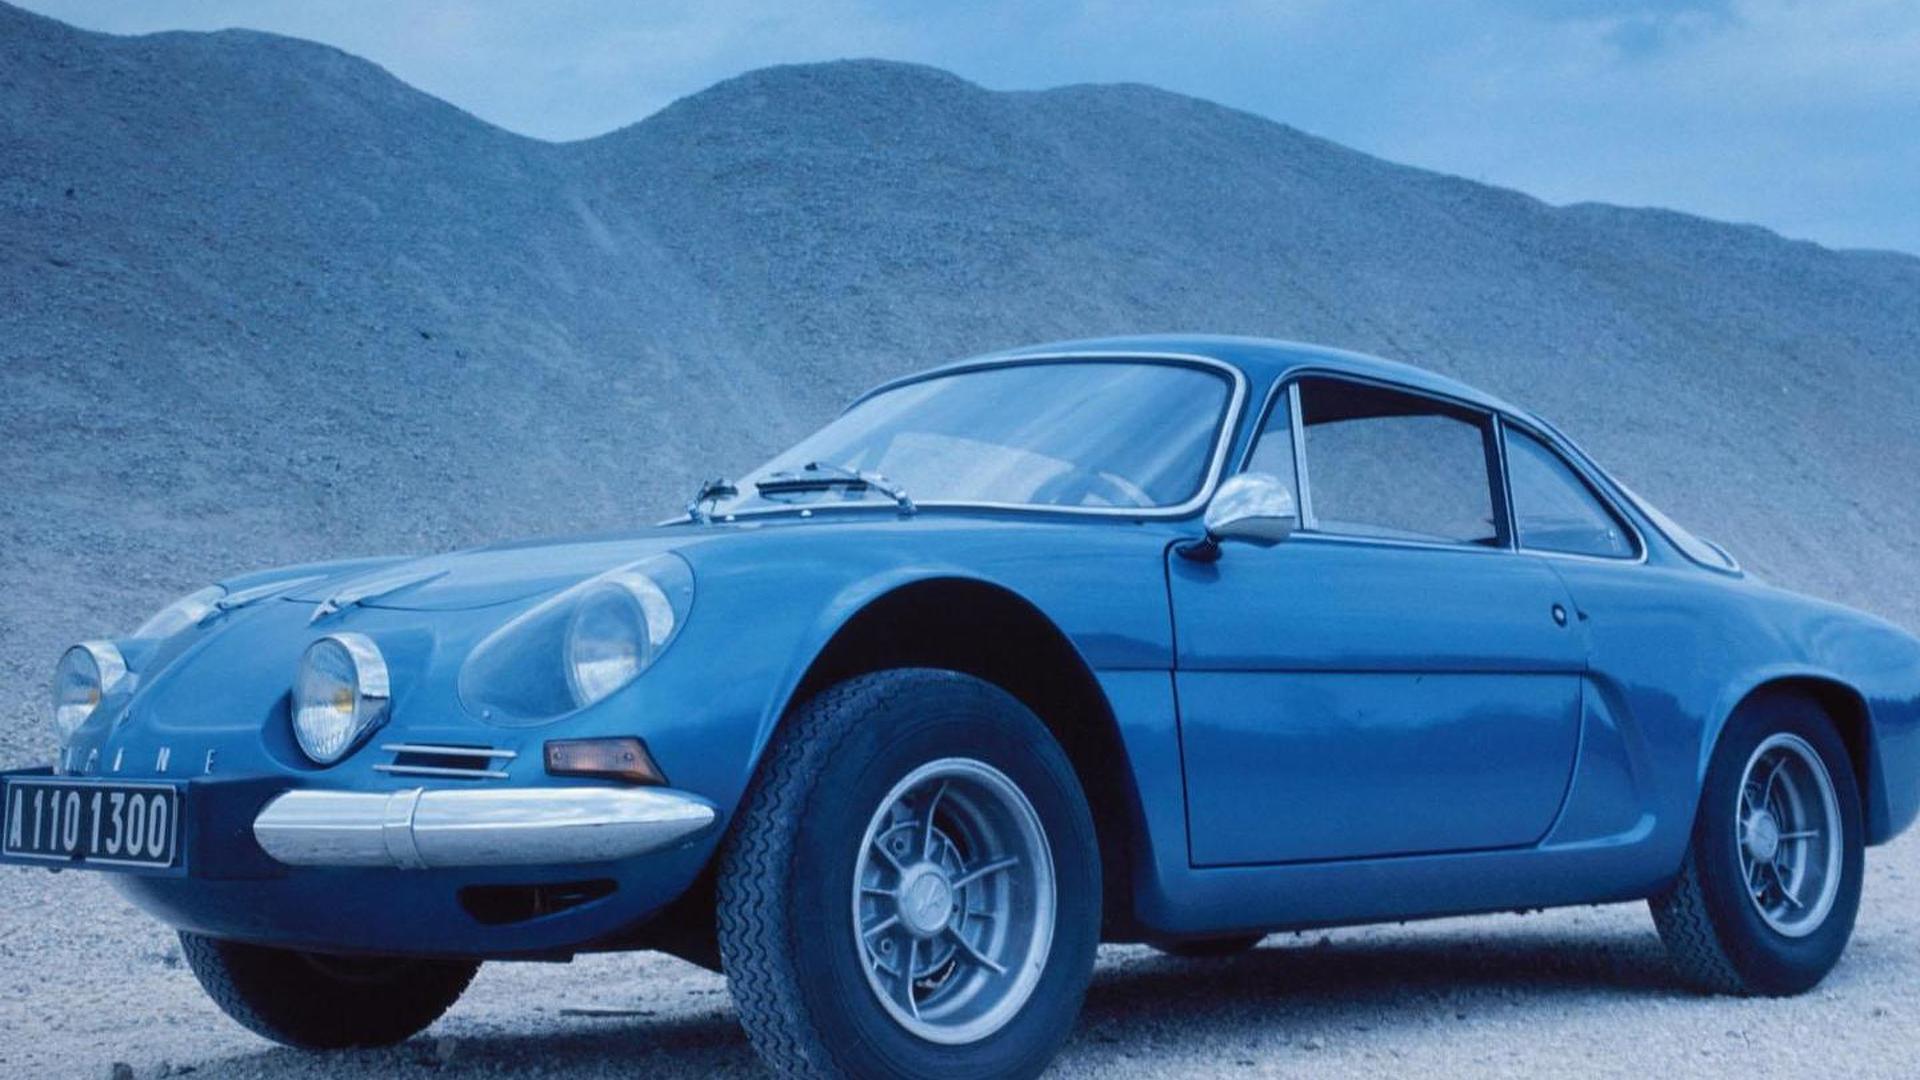 Renault Alpine concept coming to the Monaco Grand Prix - report